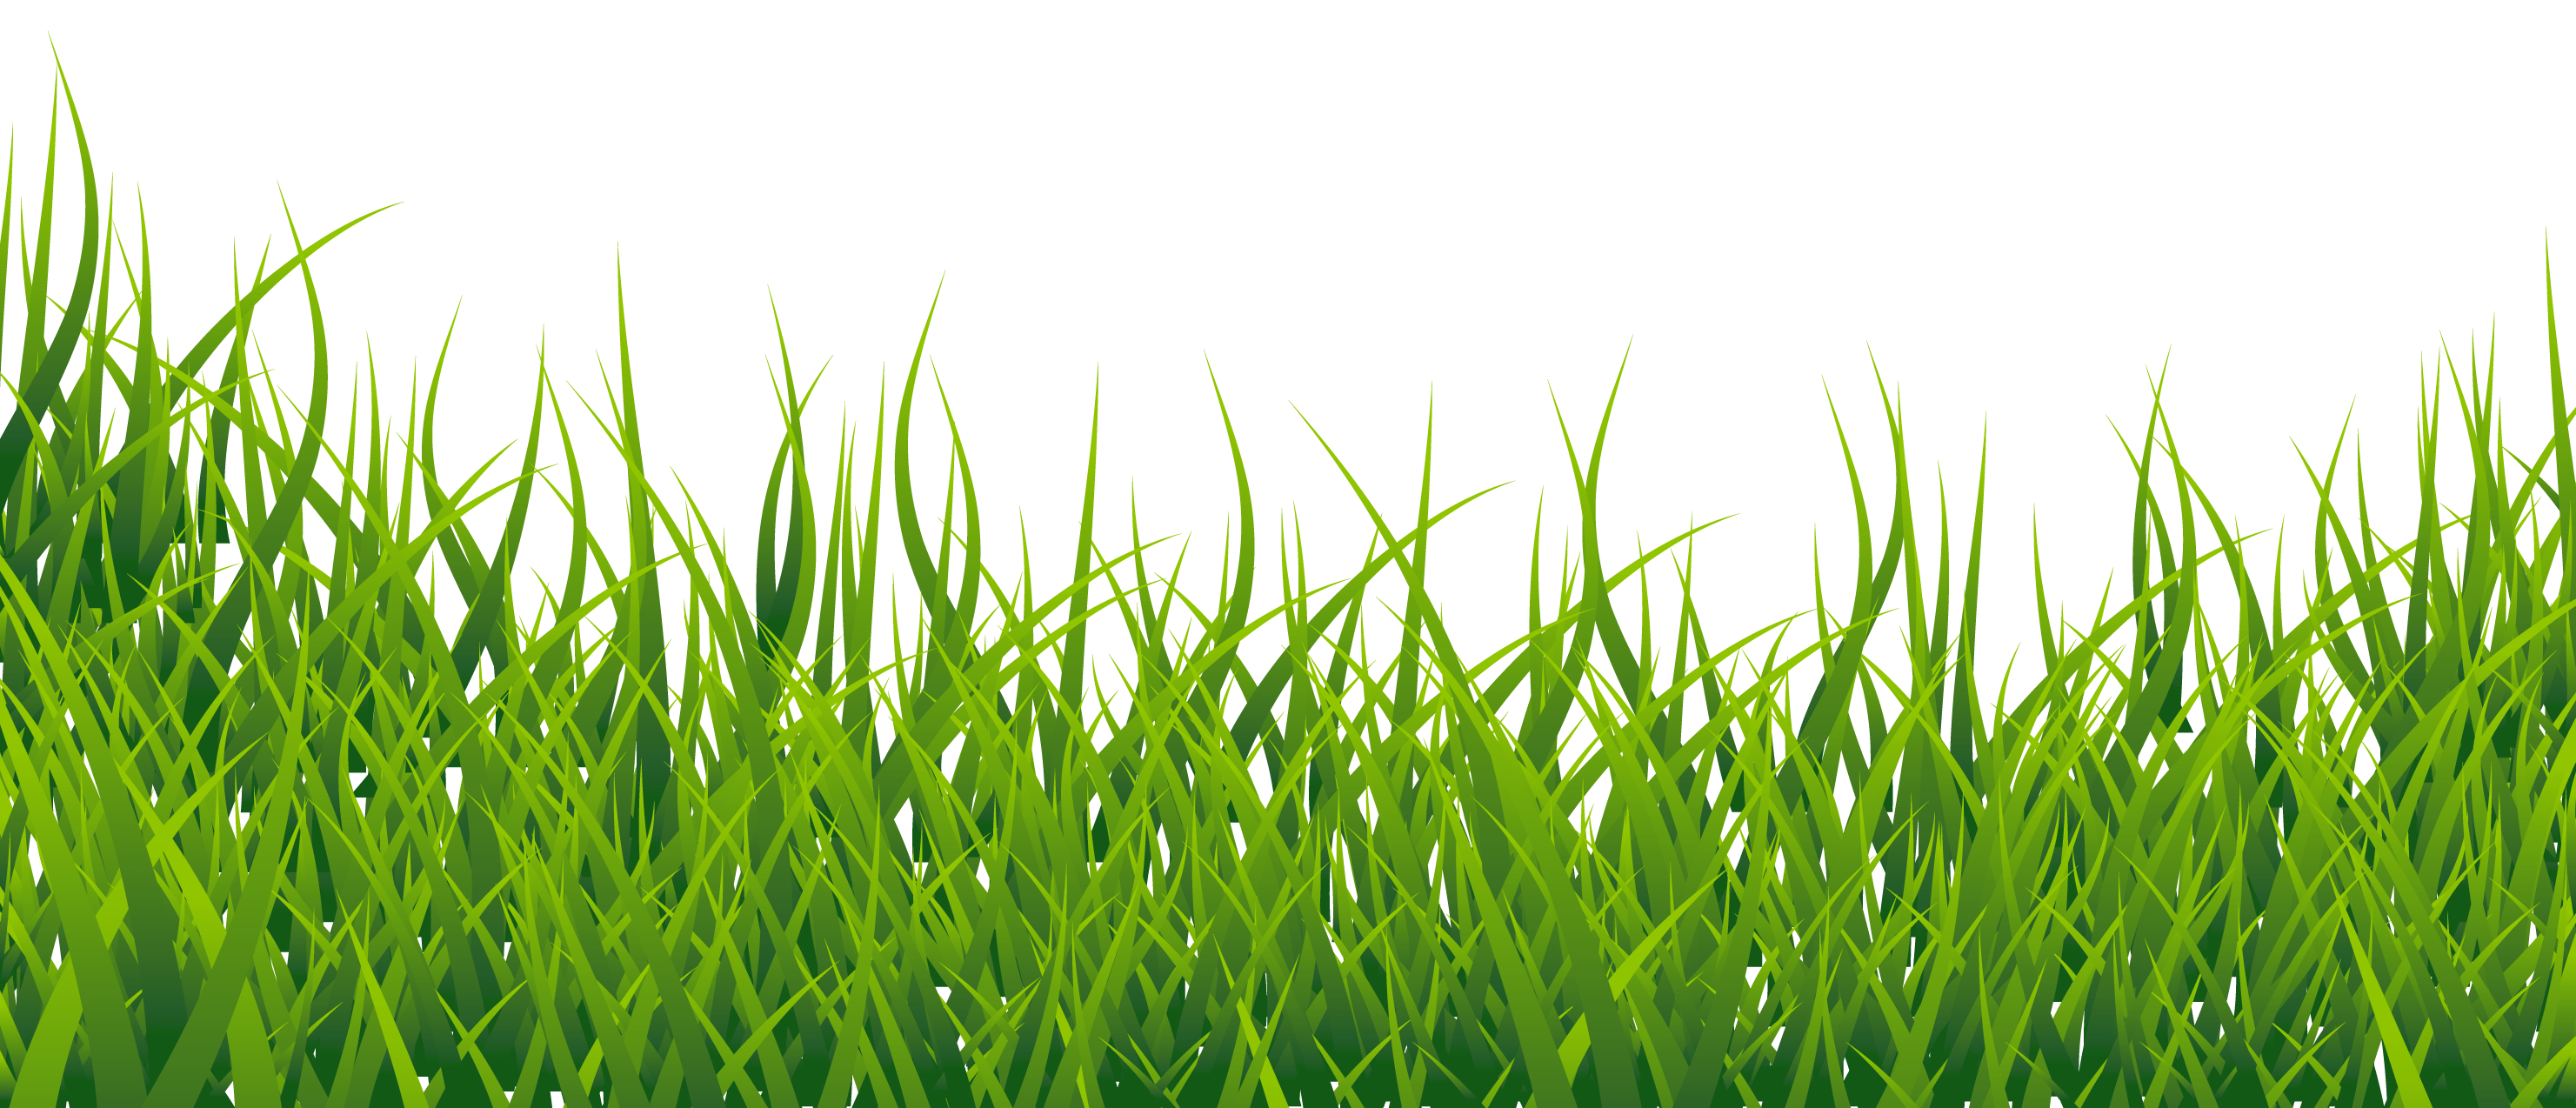 medium resolution of black and white google clipart black and white grass clipart grass vector